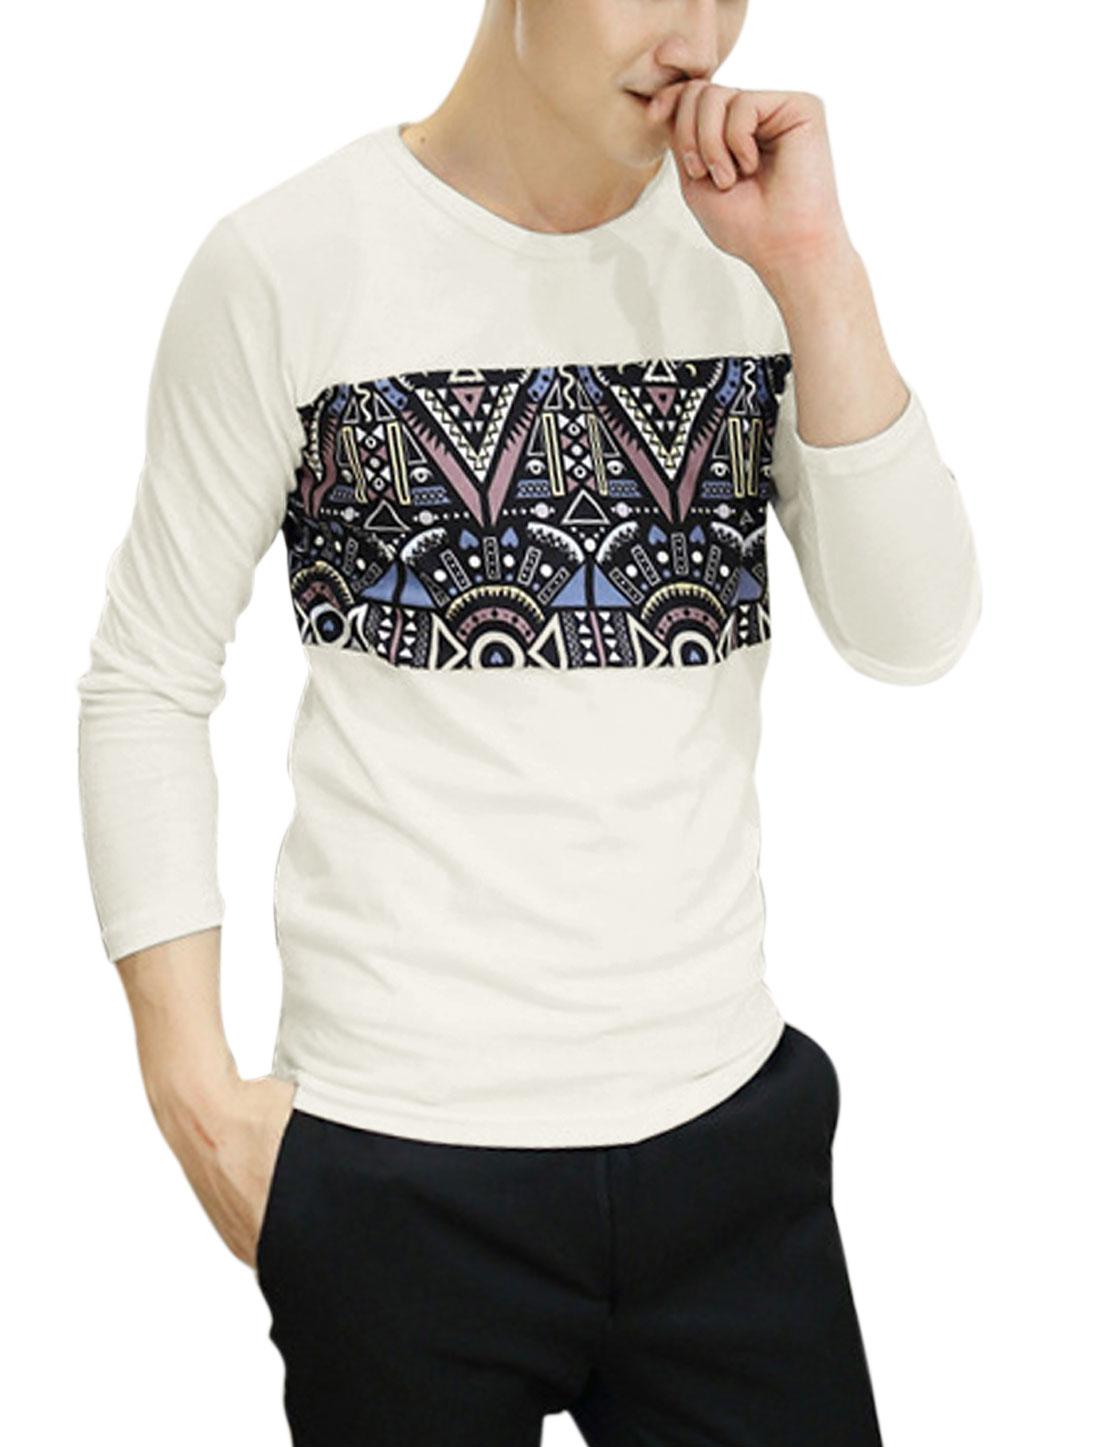 Man Black Round Neck Long Sleeves Pullover Slim Fit Novelty Prints Shirt S